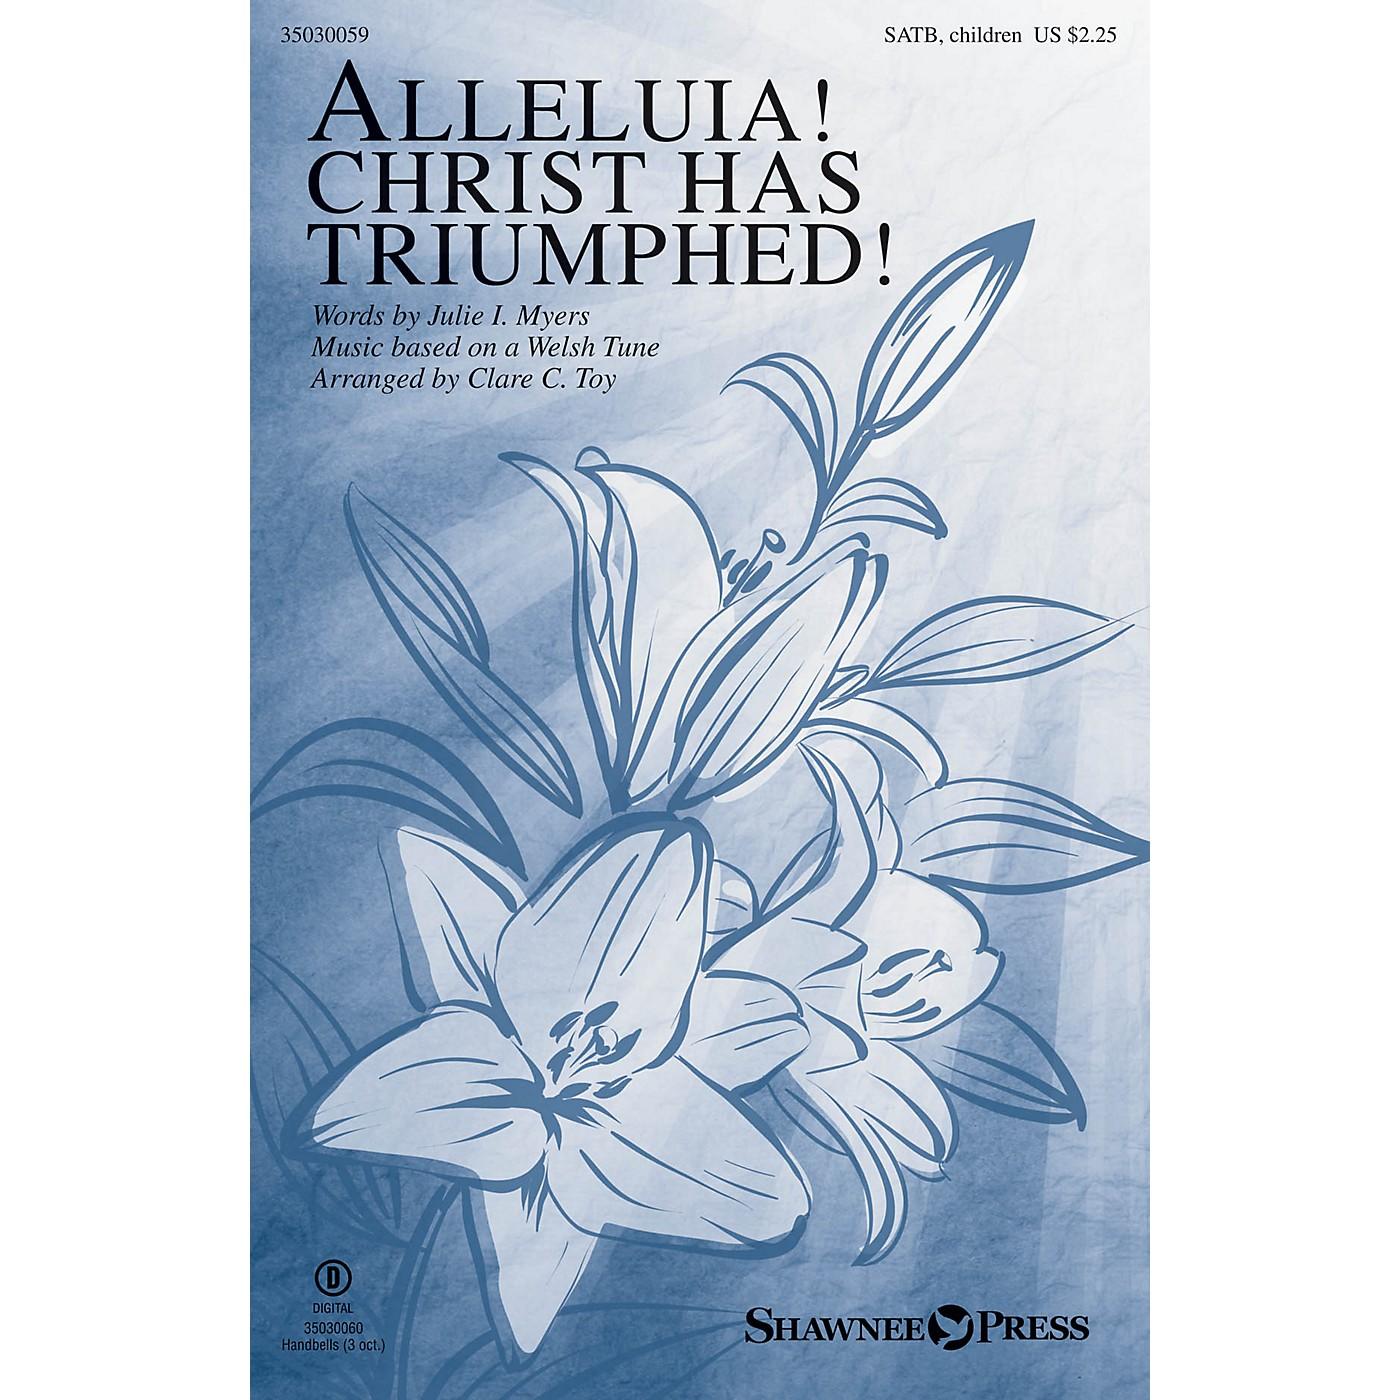 Shawnee Press Alleluia! Christ Has Triumphed! SATB/CHILDREN'S CHOIR arranged by Clare C. Toy thumbnail